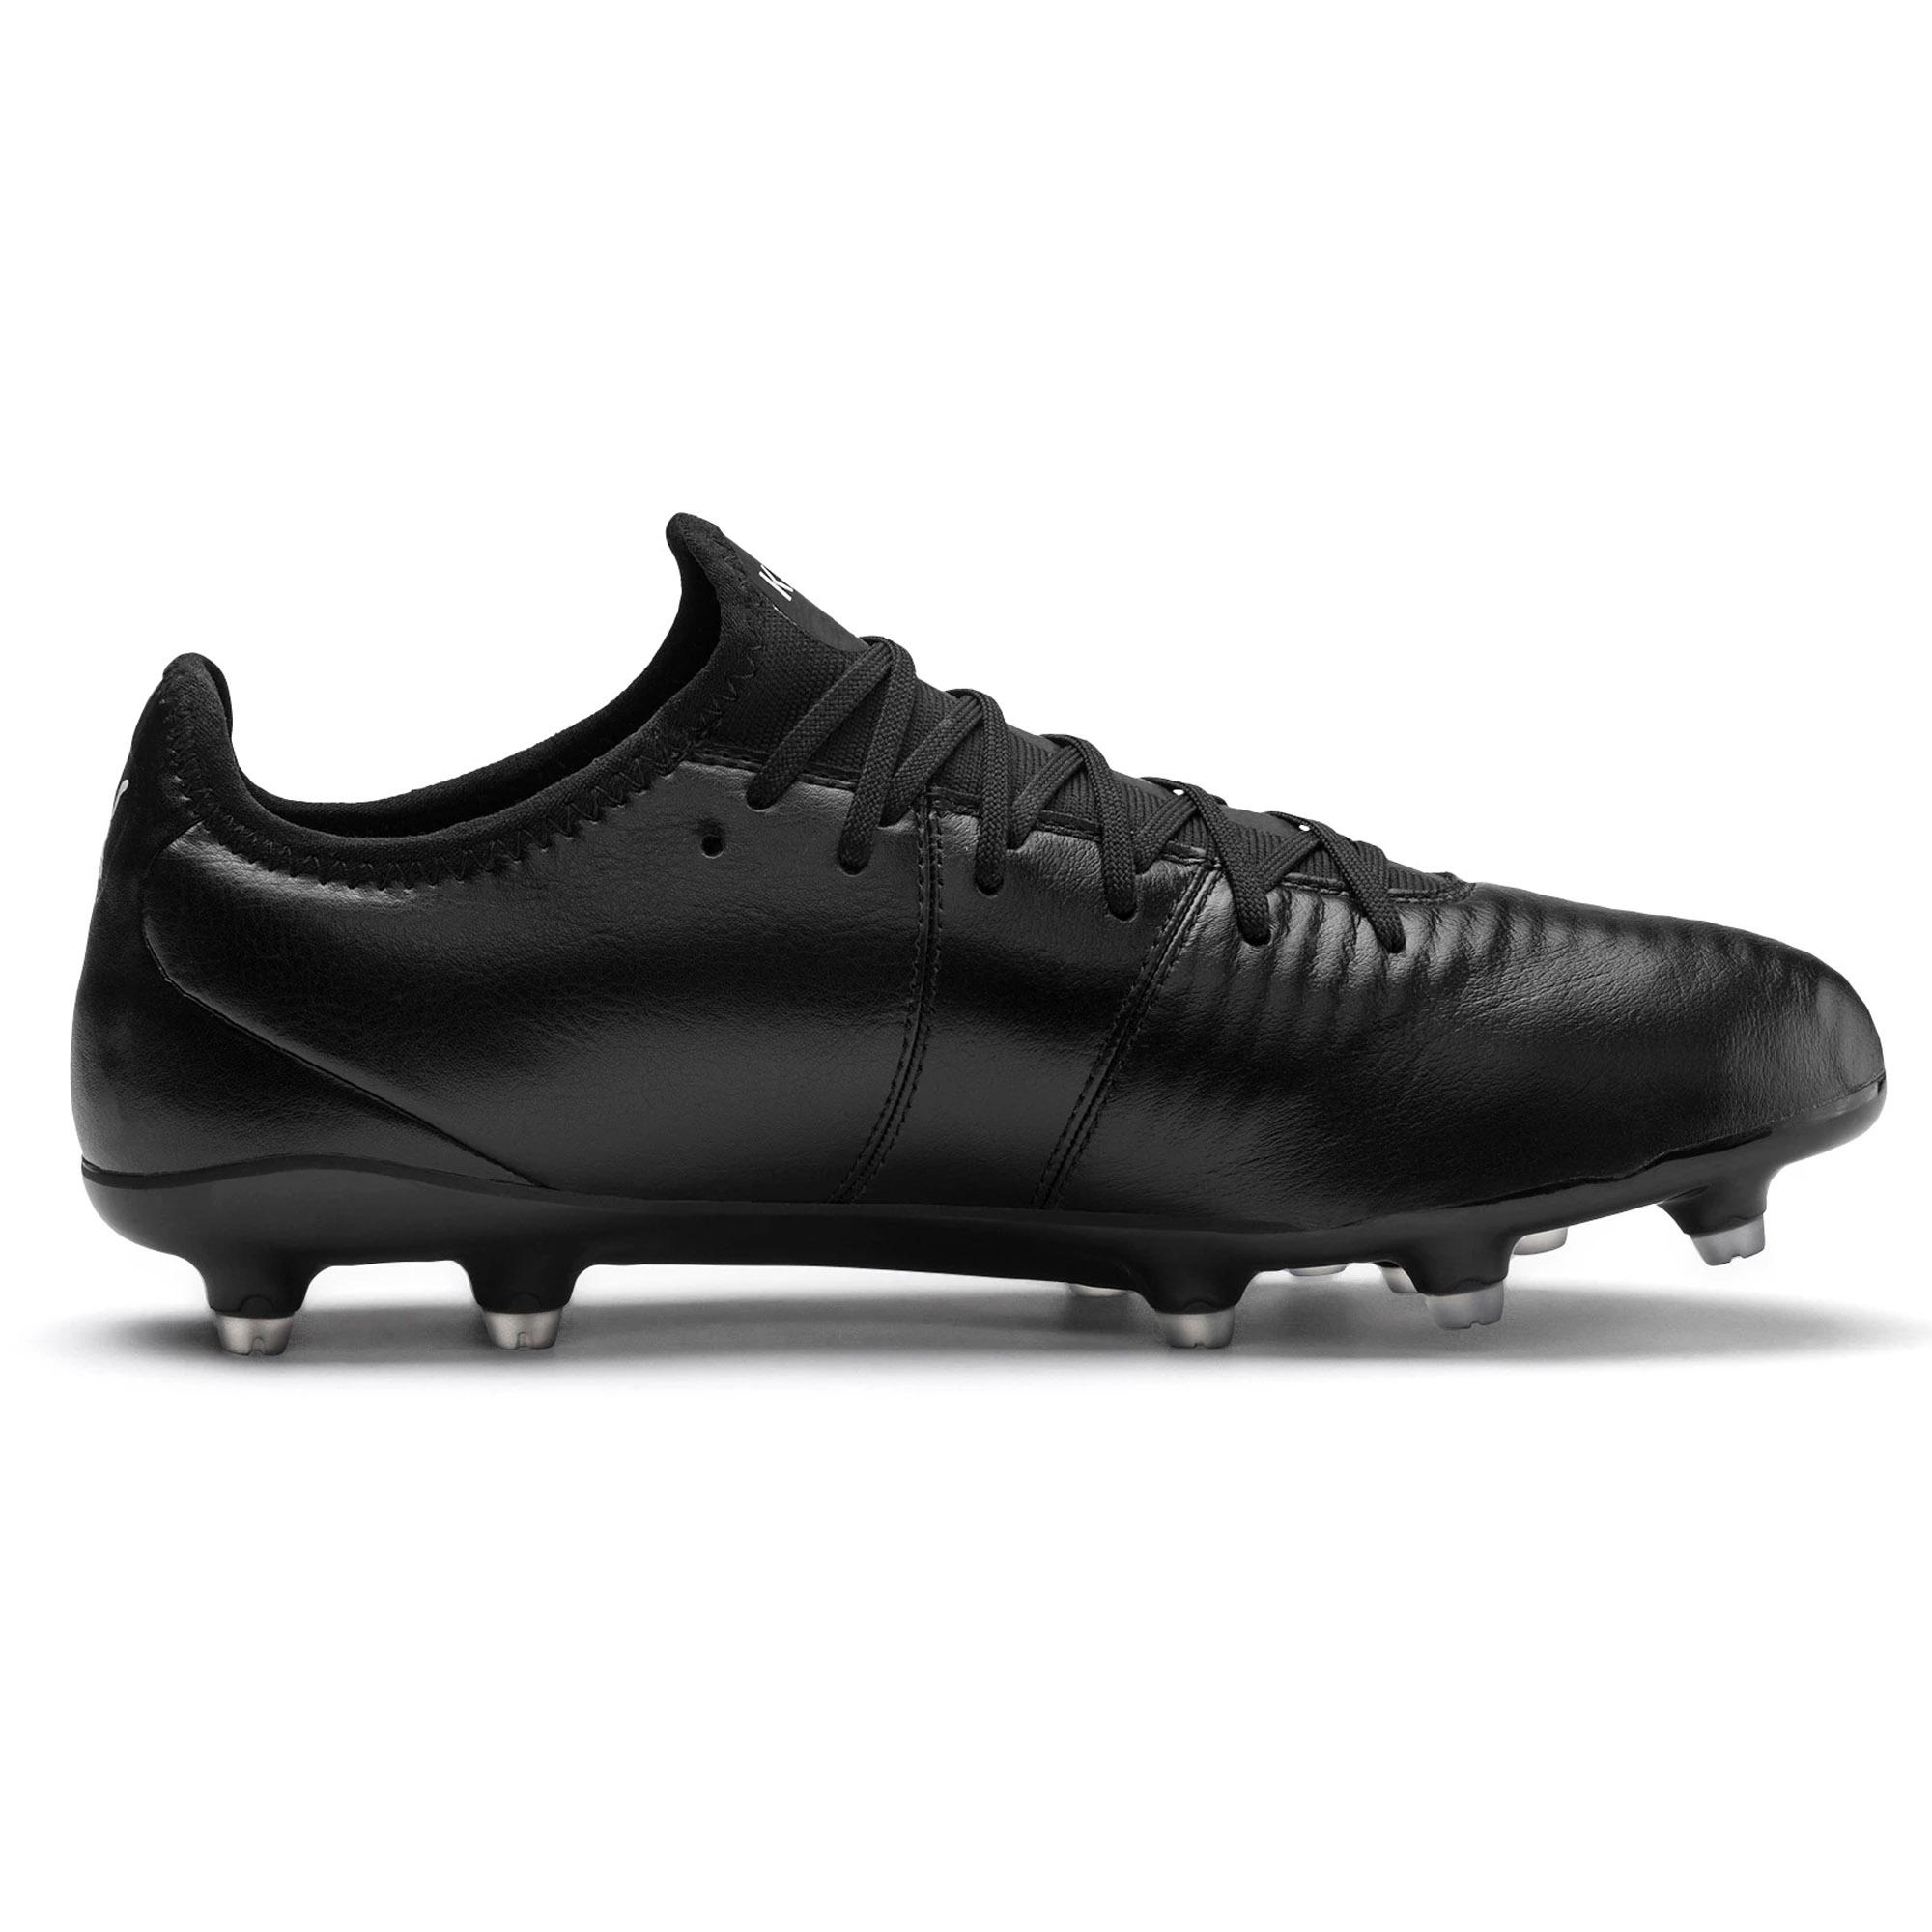 miniature 6 - Puma-King-Pro-FG-Firm-Ground-pour-homme-adulte-Football-Boot-Noir